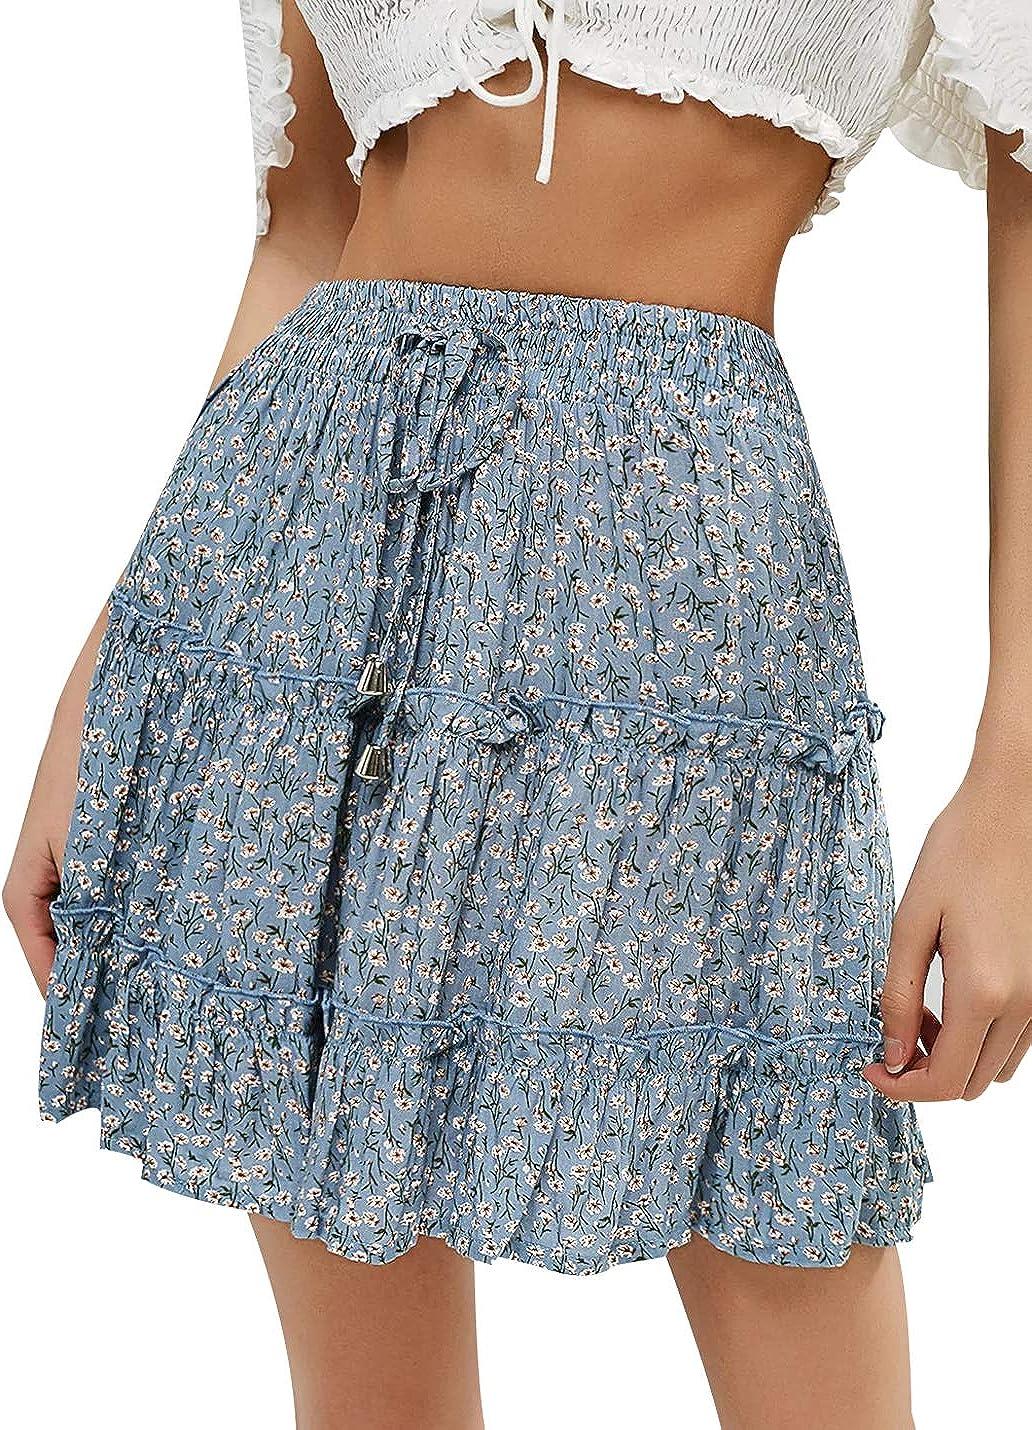 Lady Women High Waist Elastic Ruffle Short Mini Skirt Beach Holiday Mini Dresses